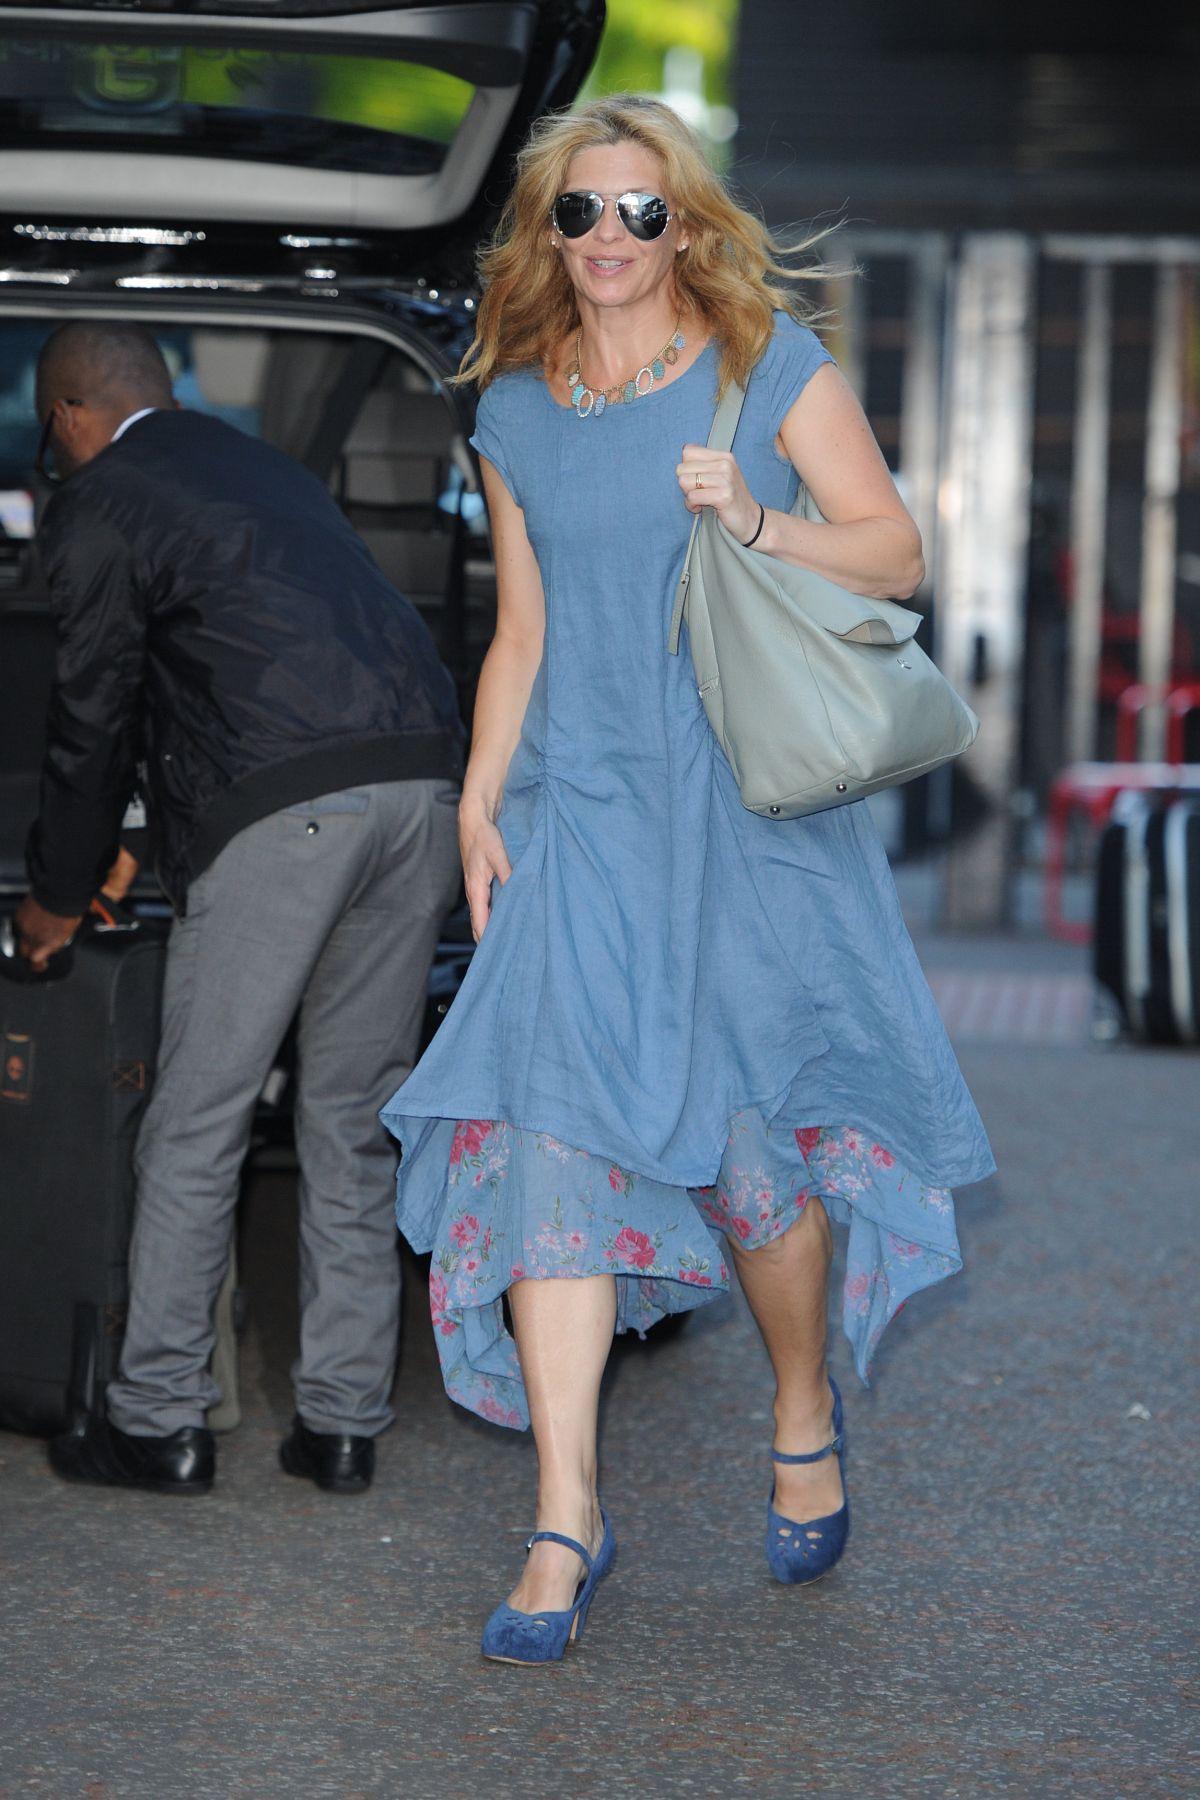 SAMANTHA GILES at ITV Studios in London 08/24/2016